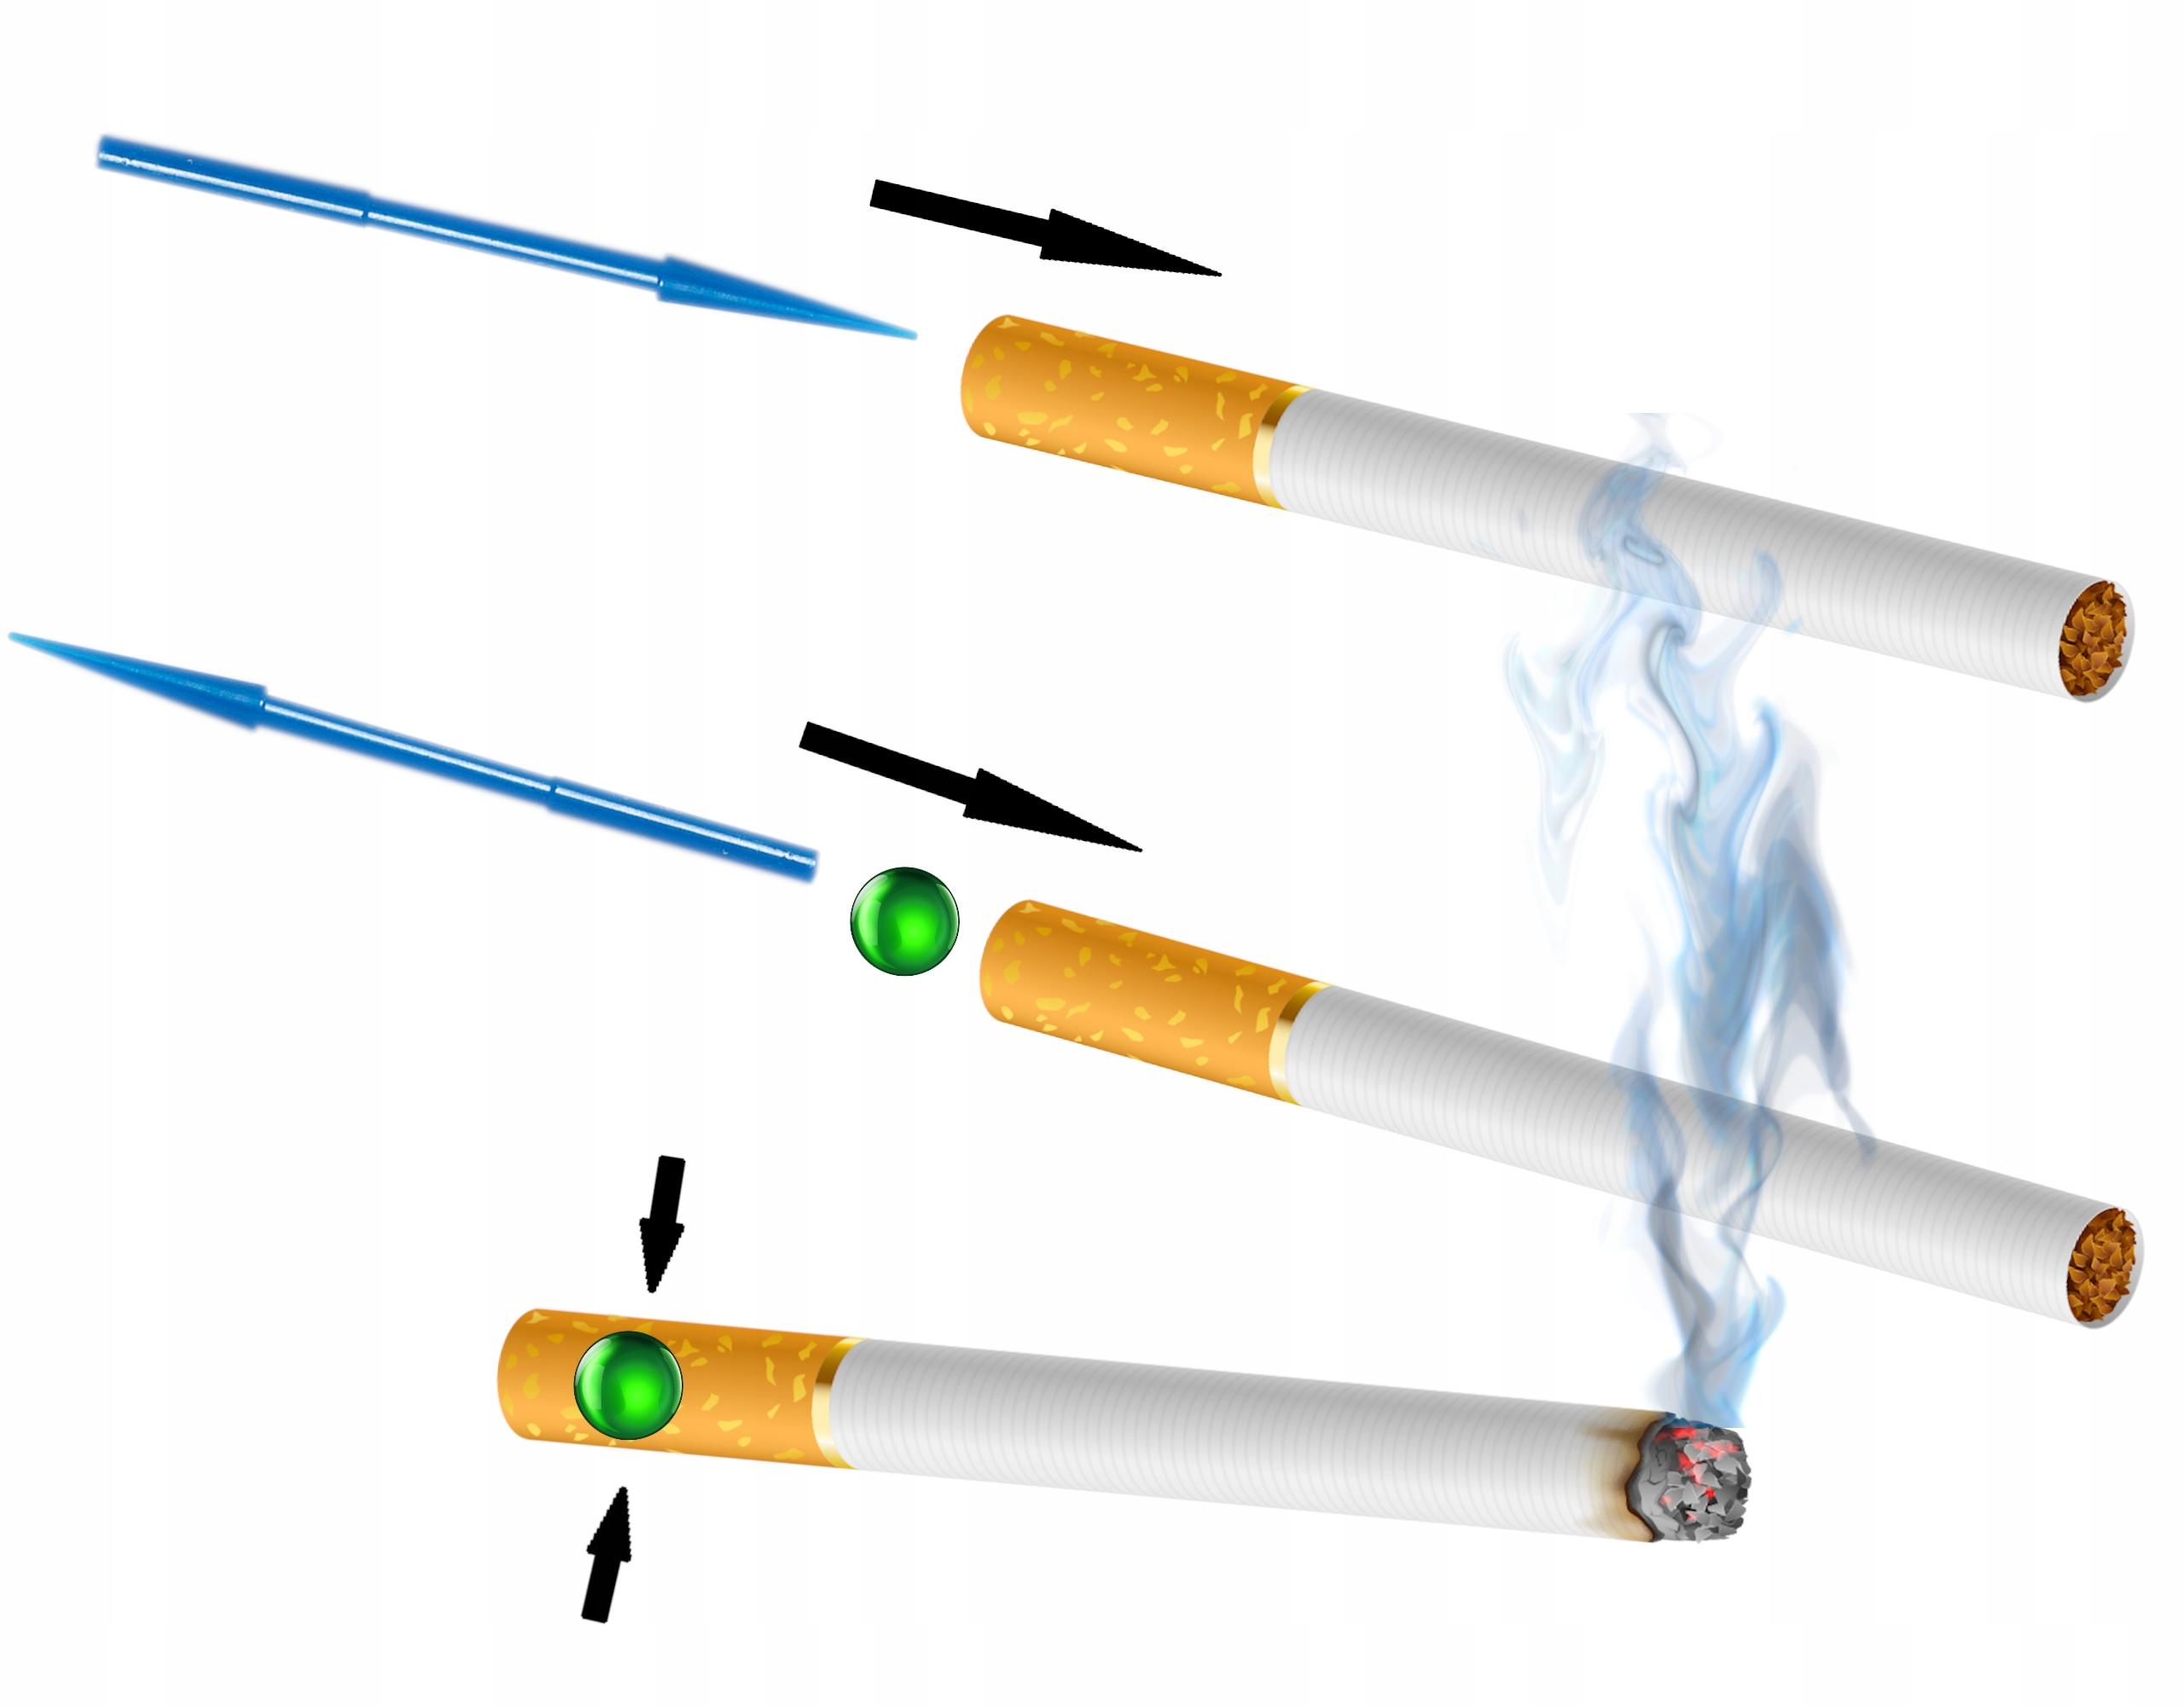 Klik kulka капсулы для сигарет купить купить сигареты казбек